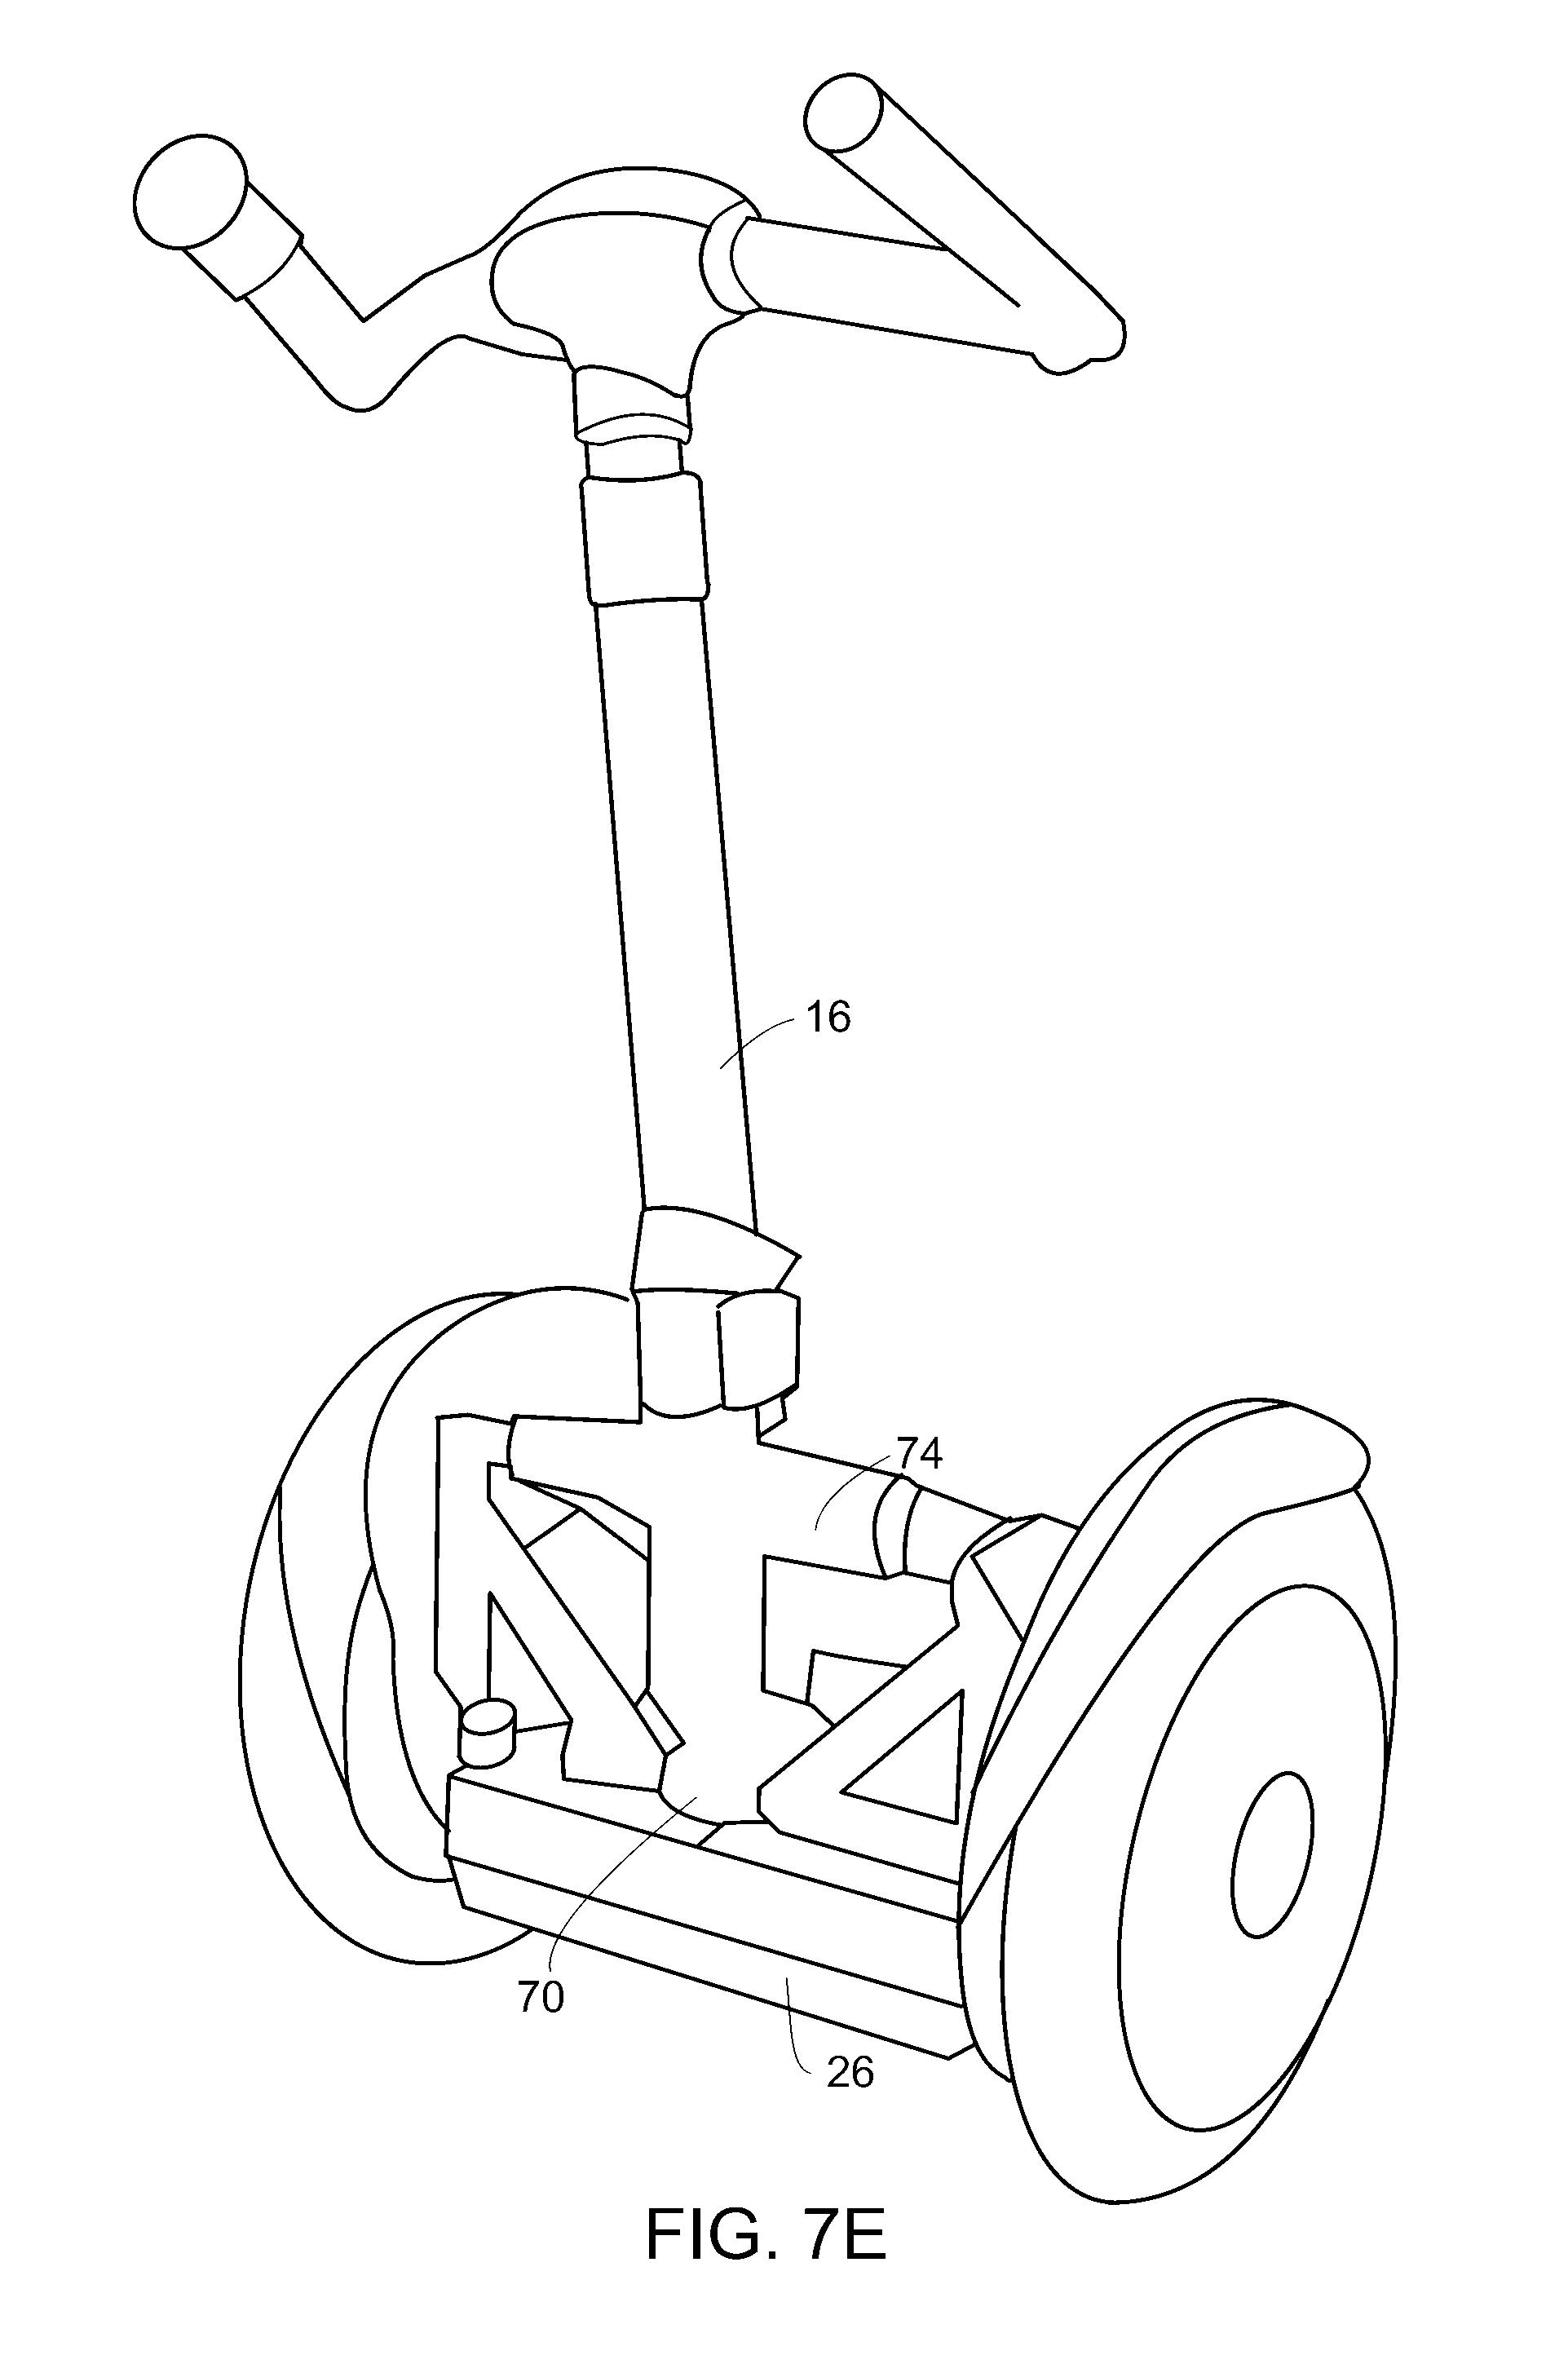 Patent US 9,411,339 B2